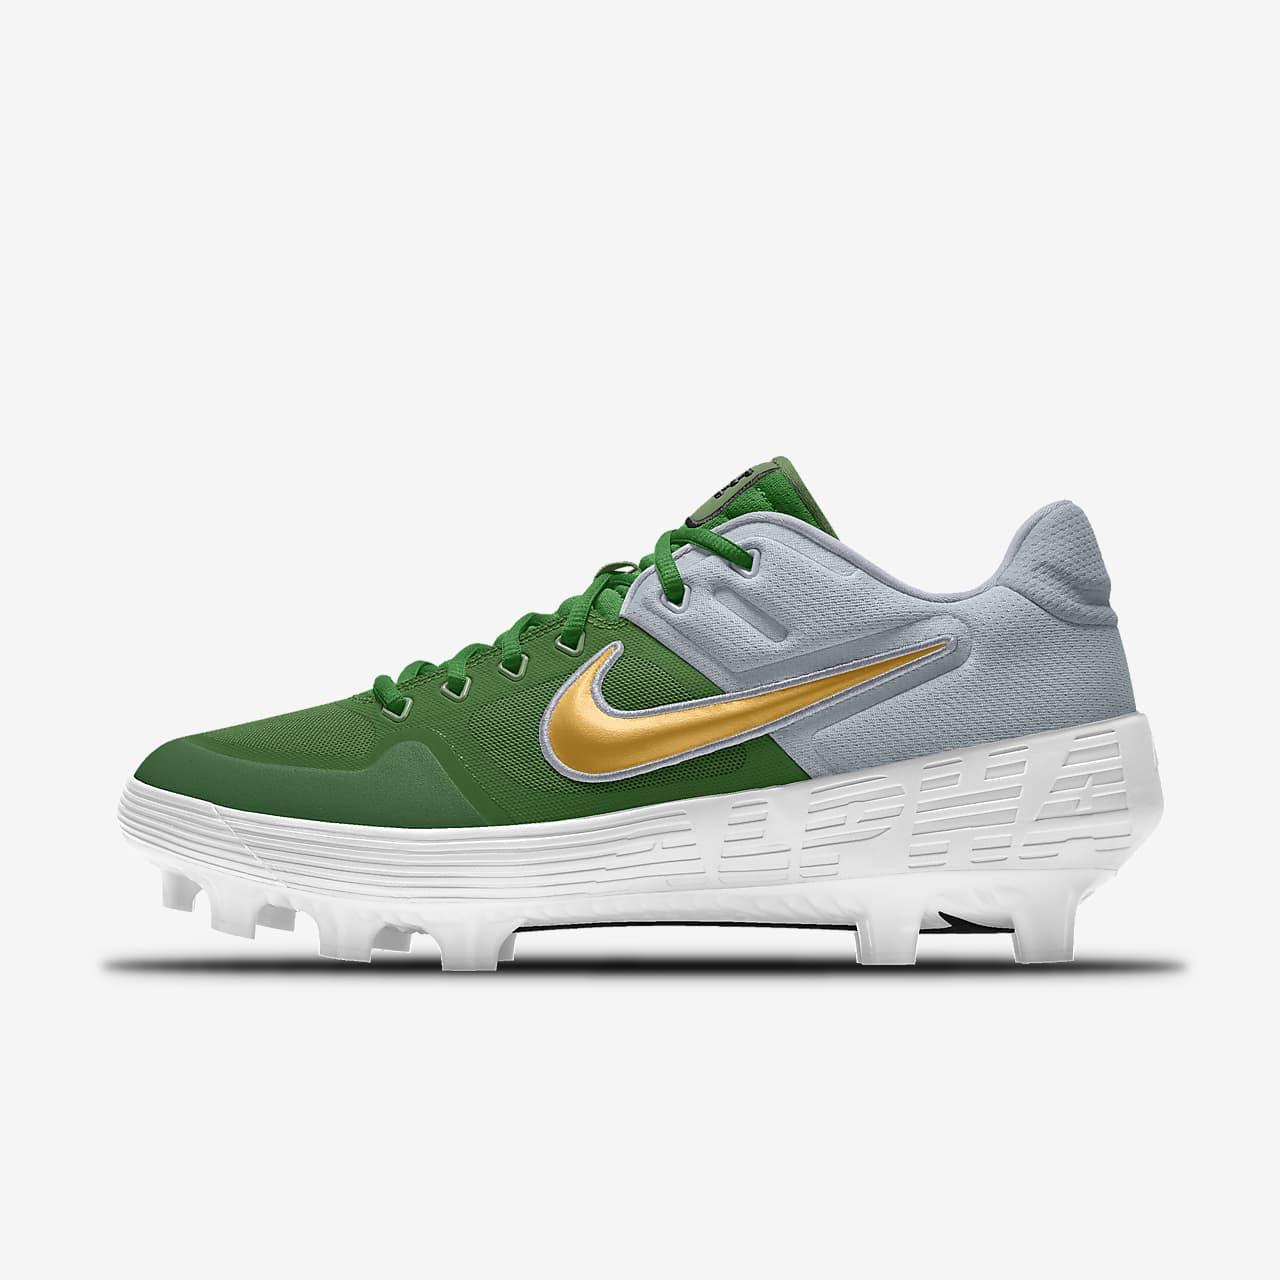 Nike Alpha Huarache Elite 2 Low MCS By You Custom Baseball Cleat